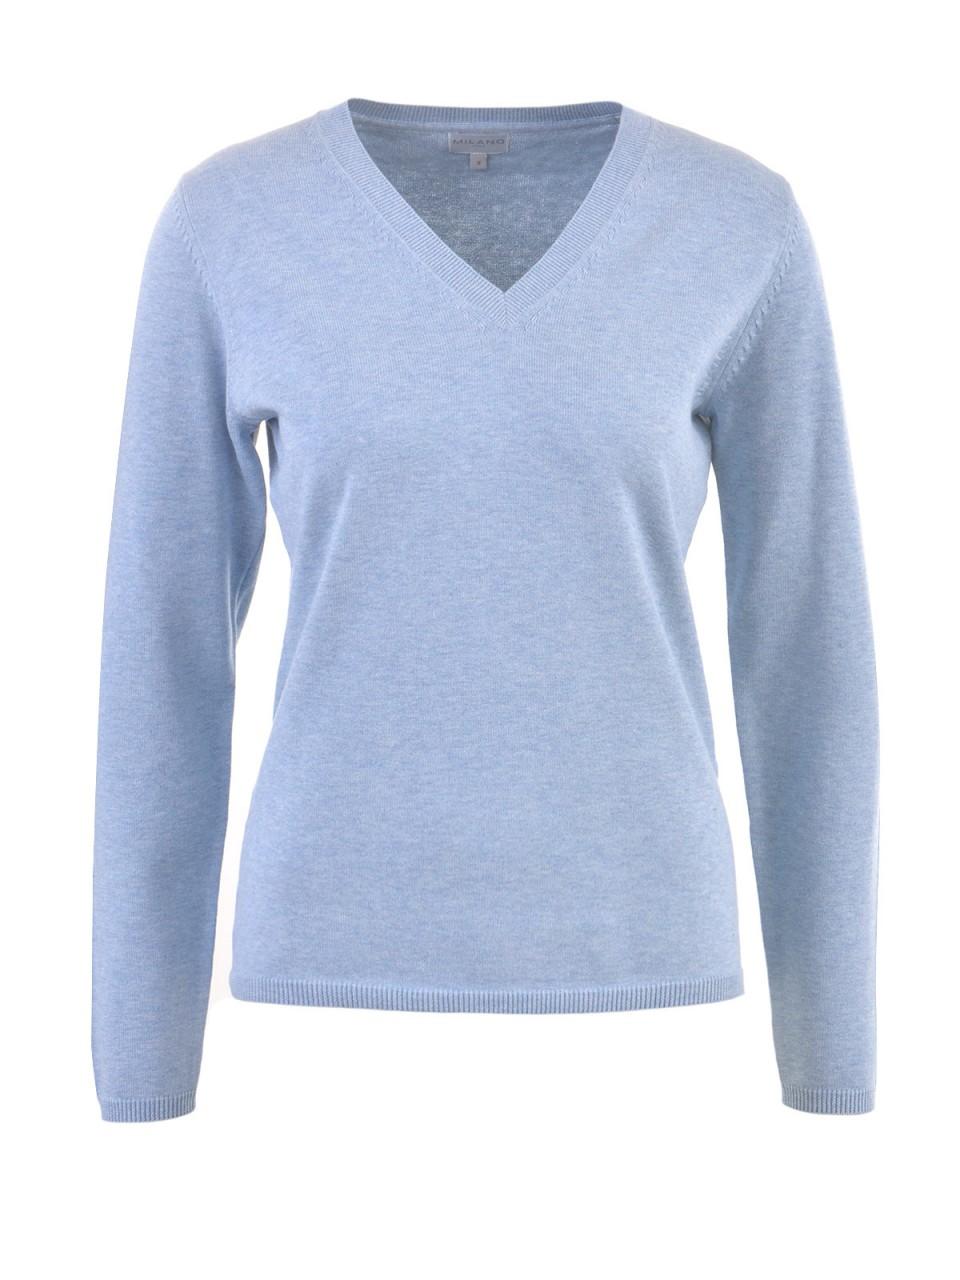 milano-italy-damen-pullover-blau